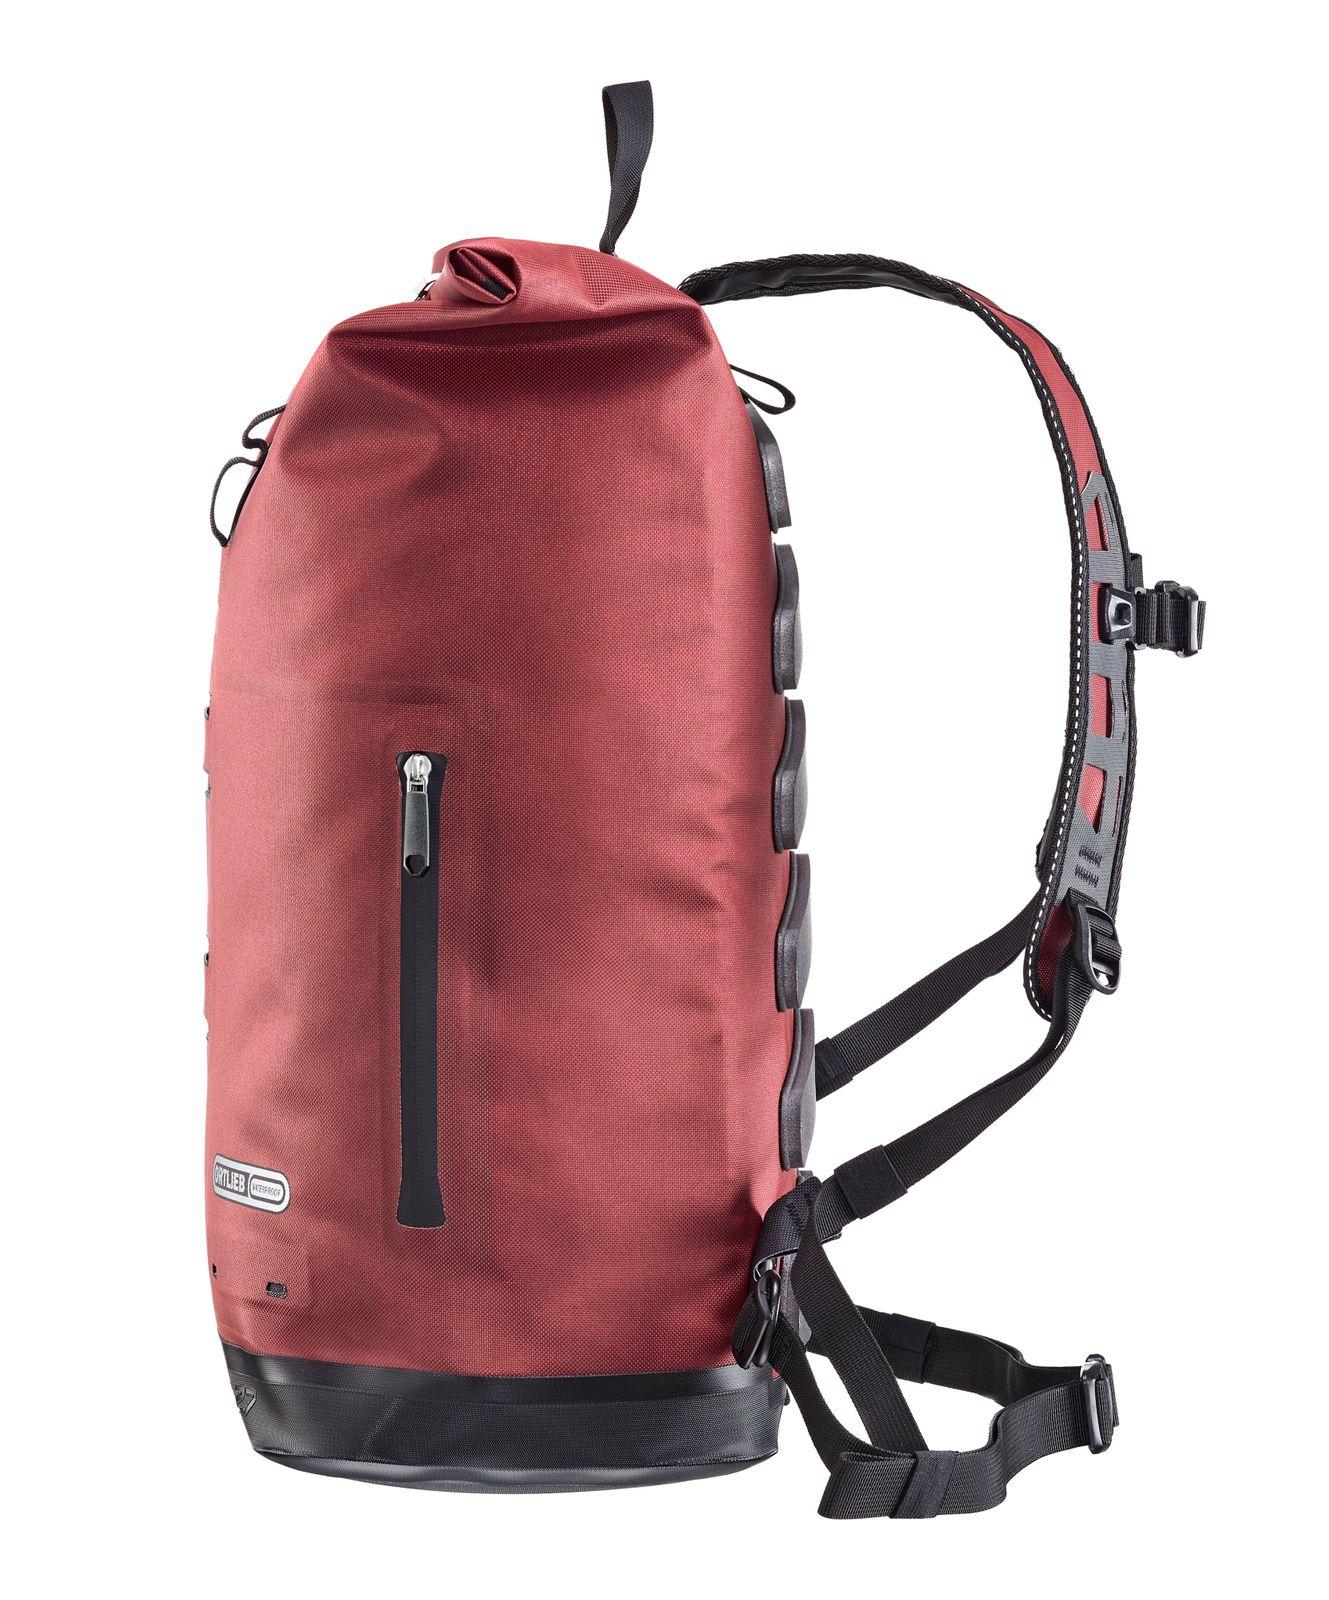 ORTLIEB City Commuter-Daypack City Backpack 27L Dark Chili